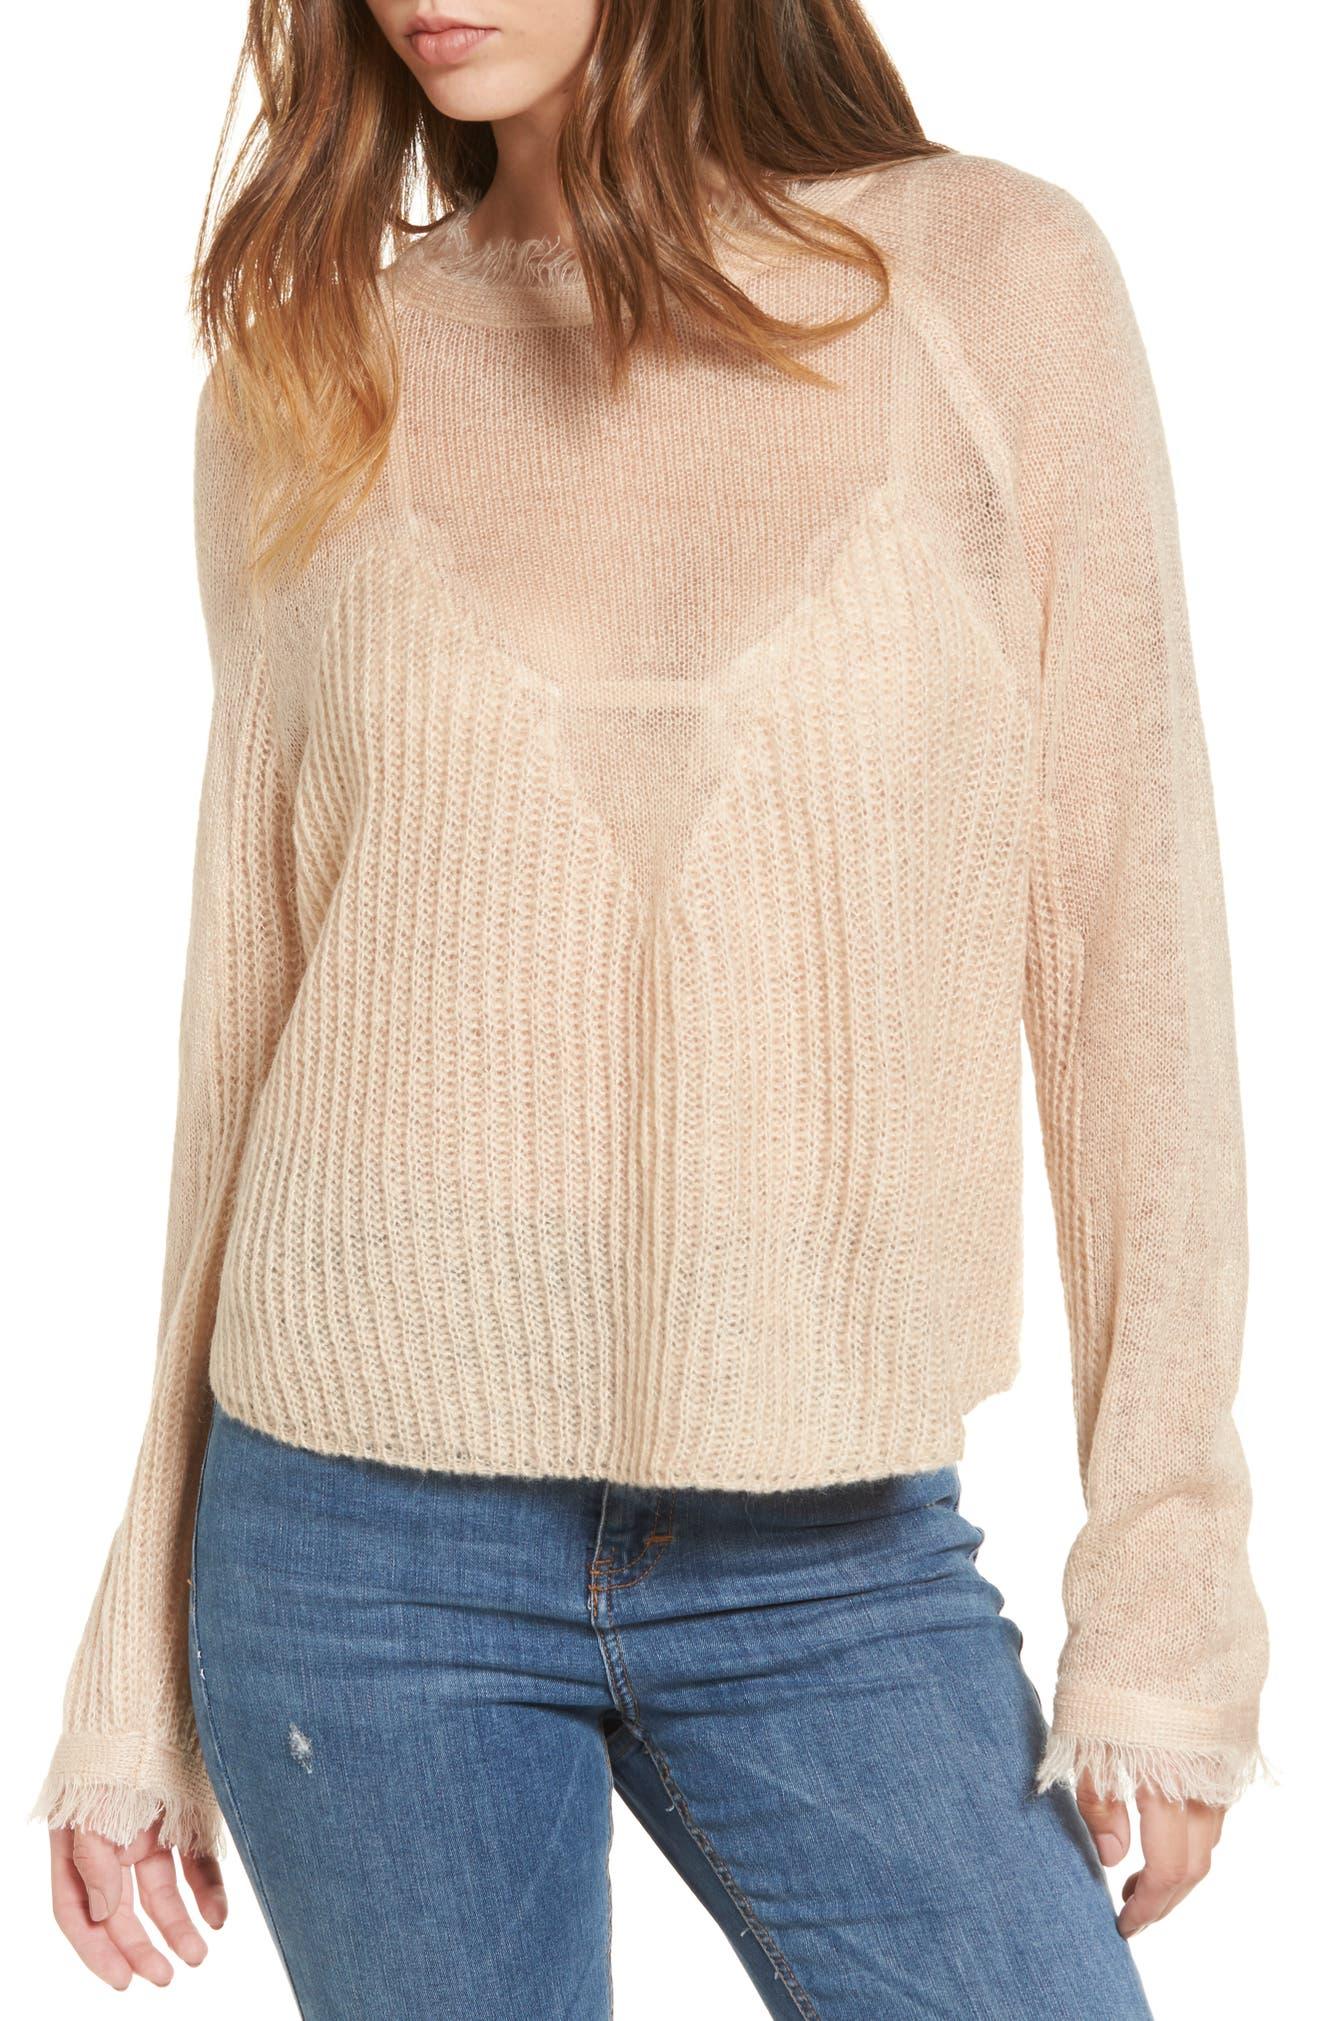 9d20f7bda2a8 MOON RIVER Sheer Knit Raglan Sweater